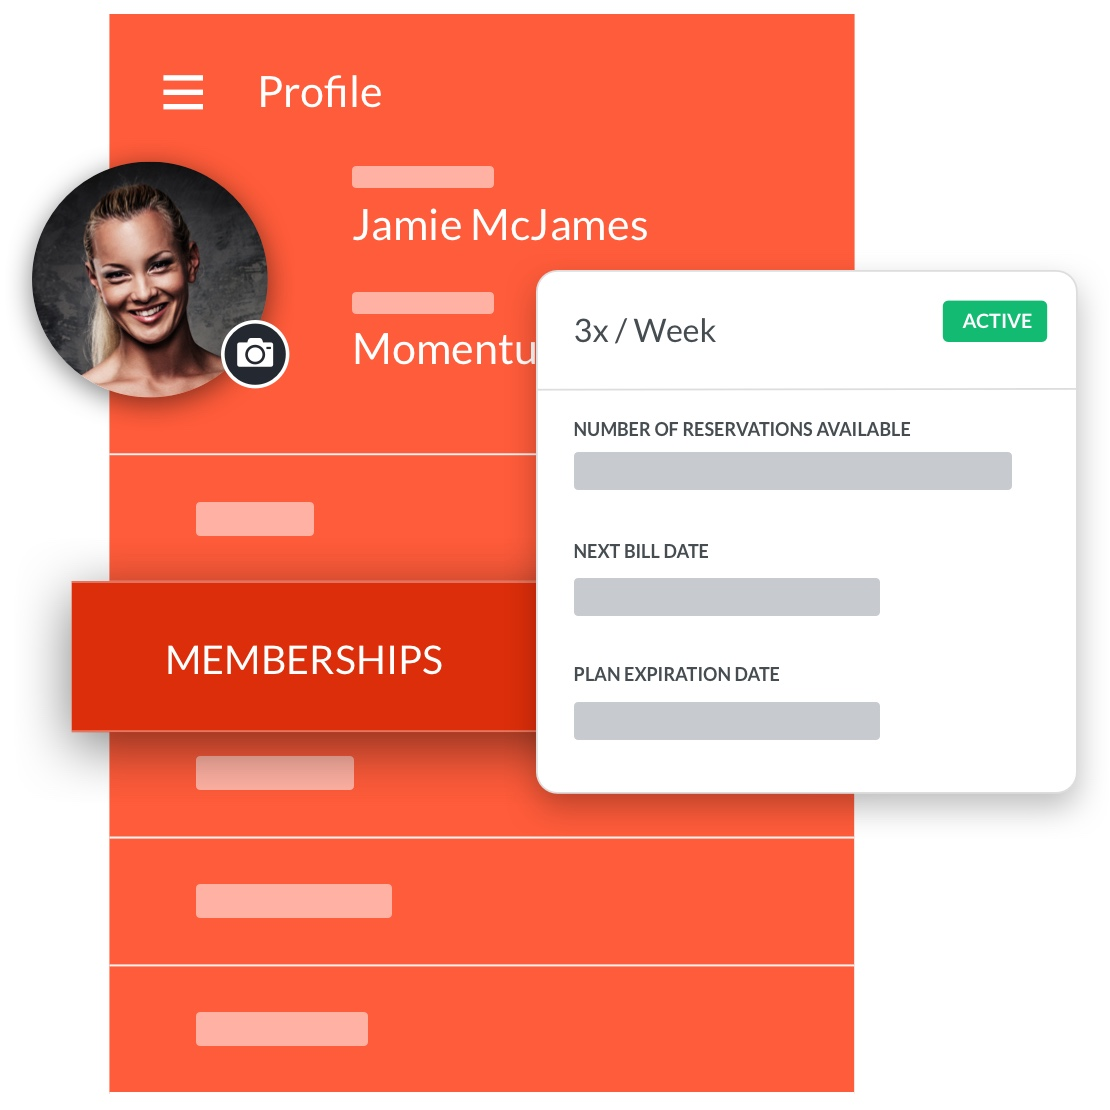 spin studio software member profile management